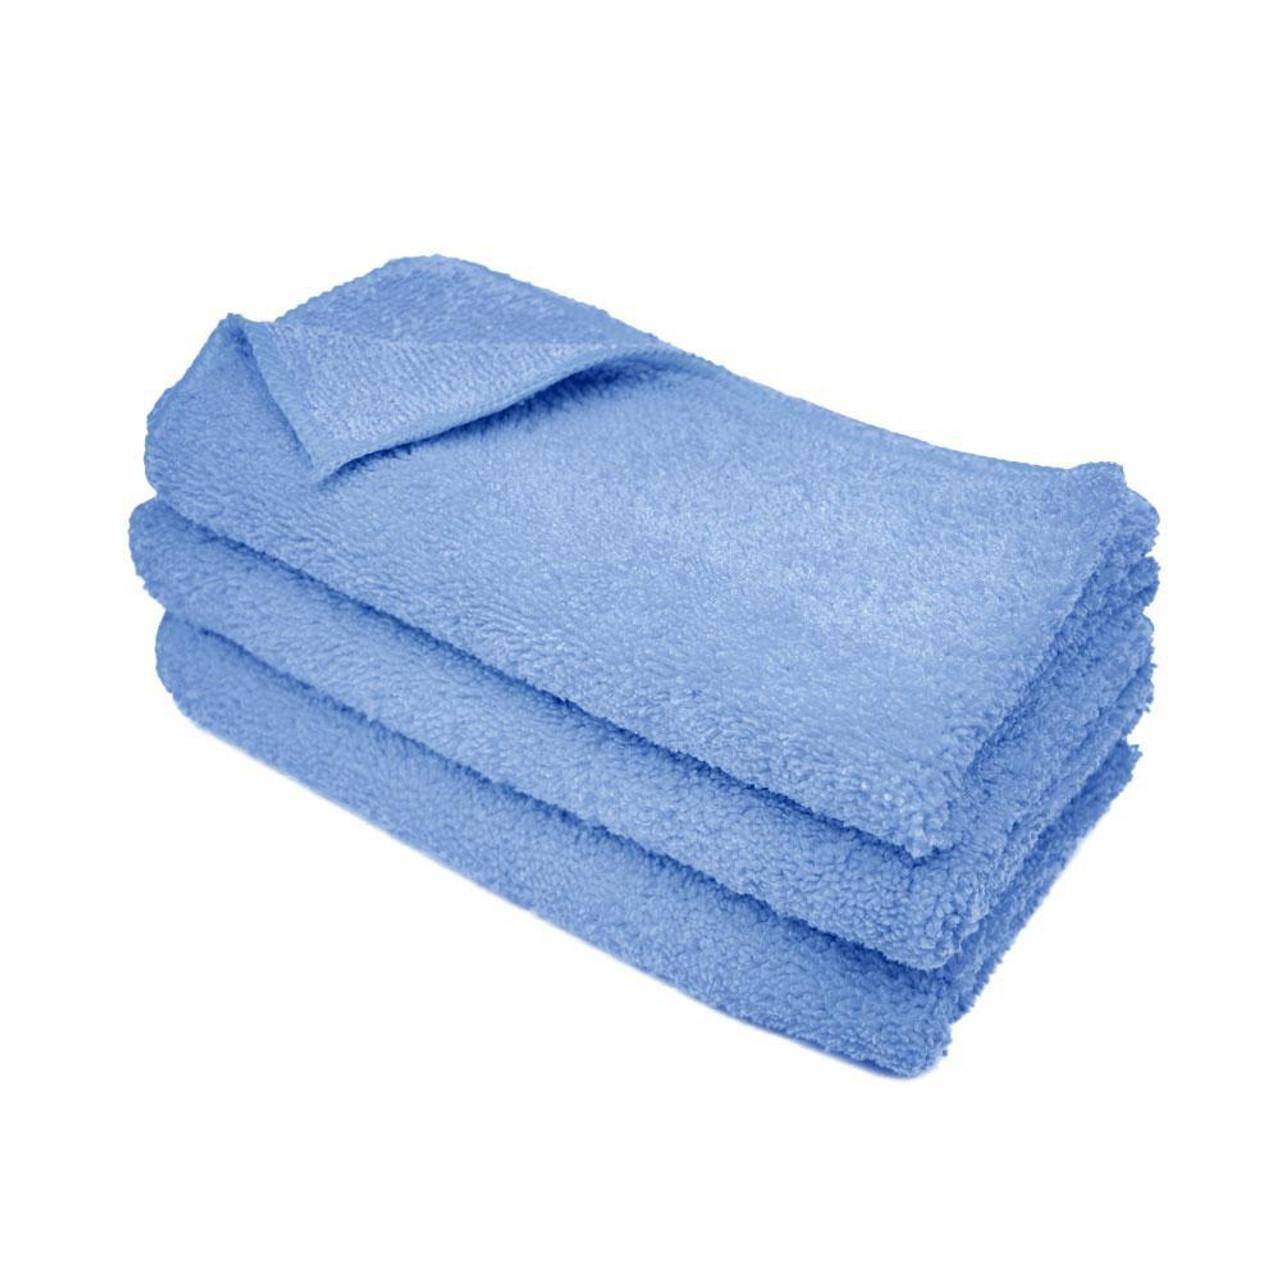 Cloths/Towels/Rags